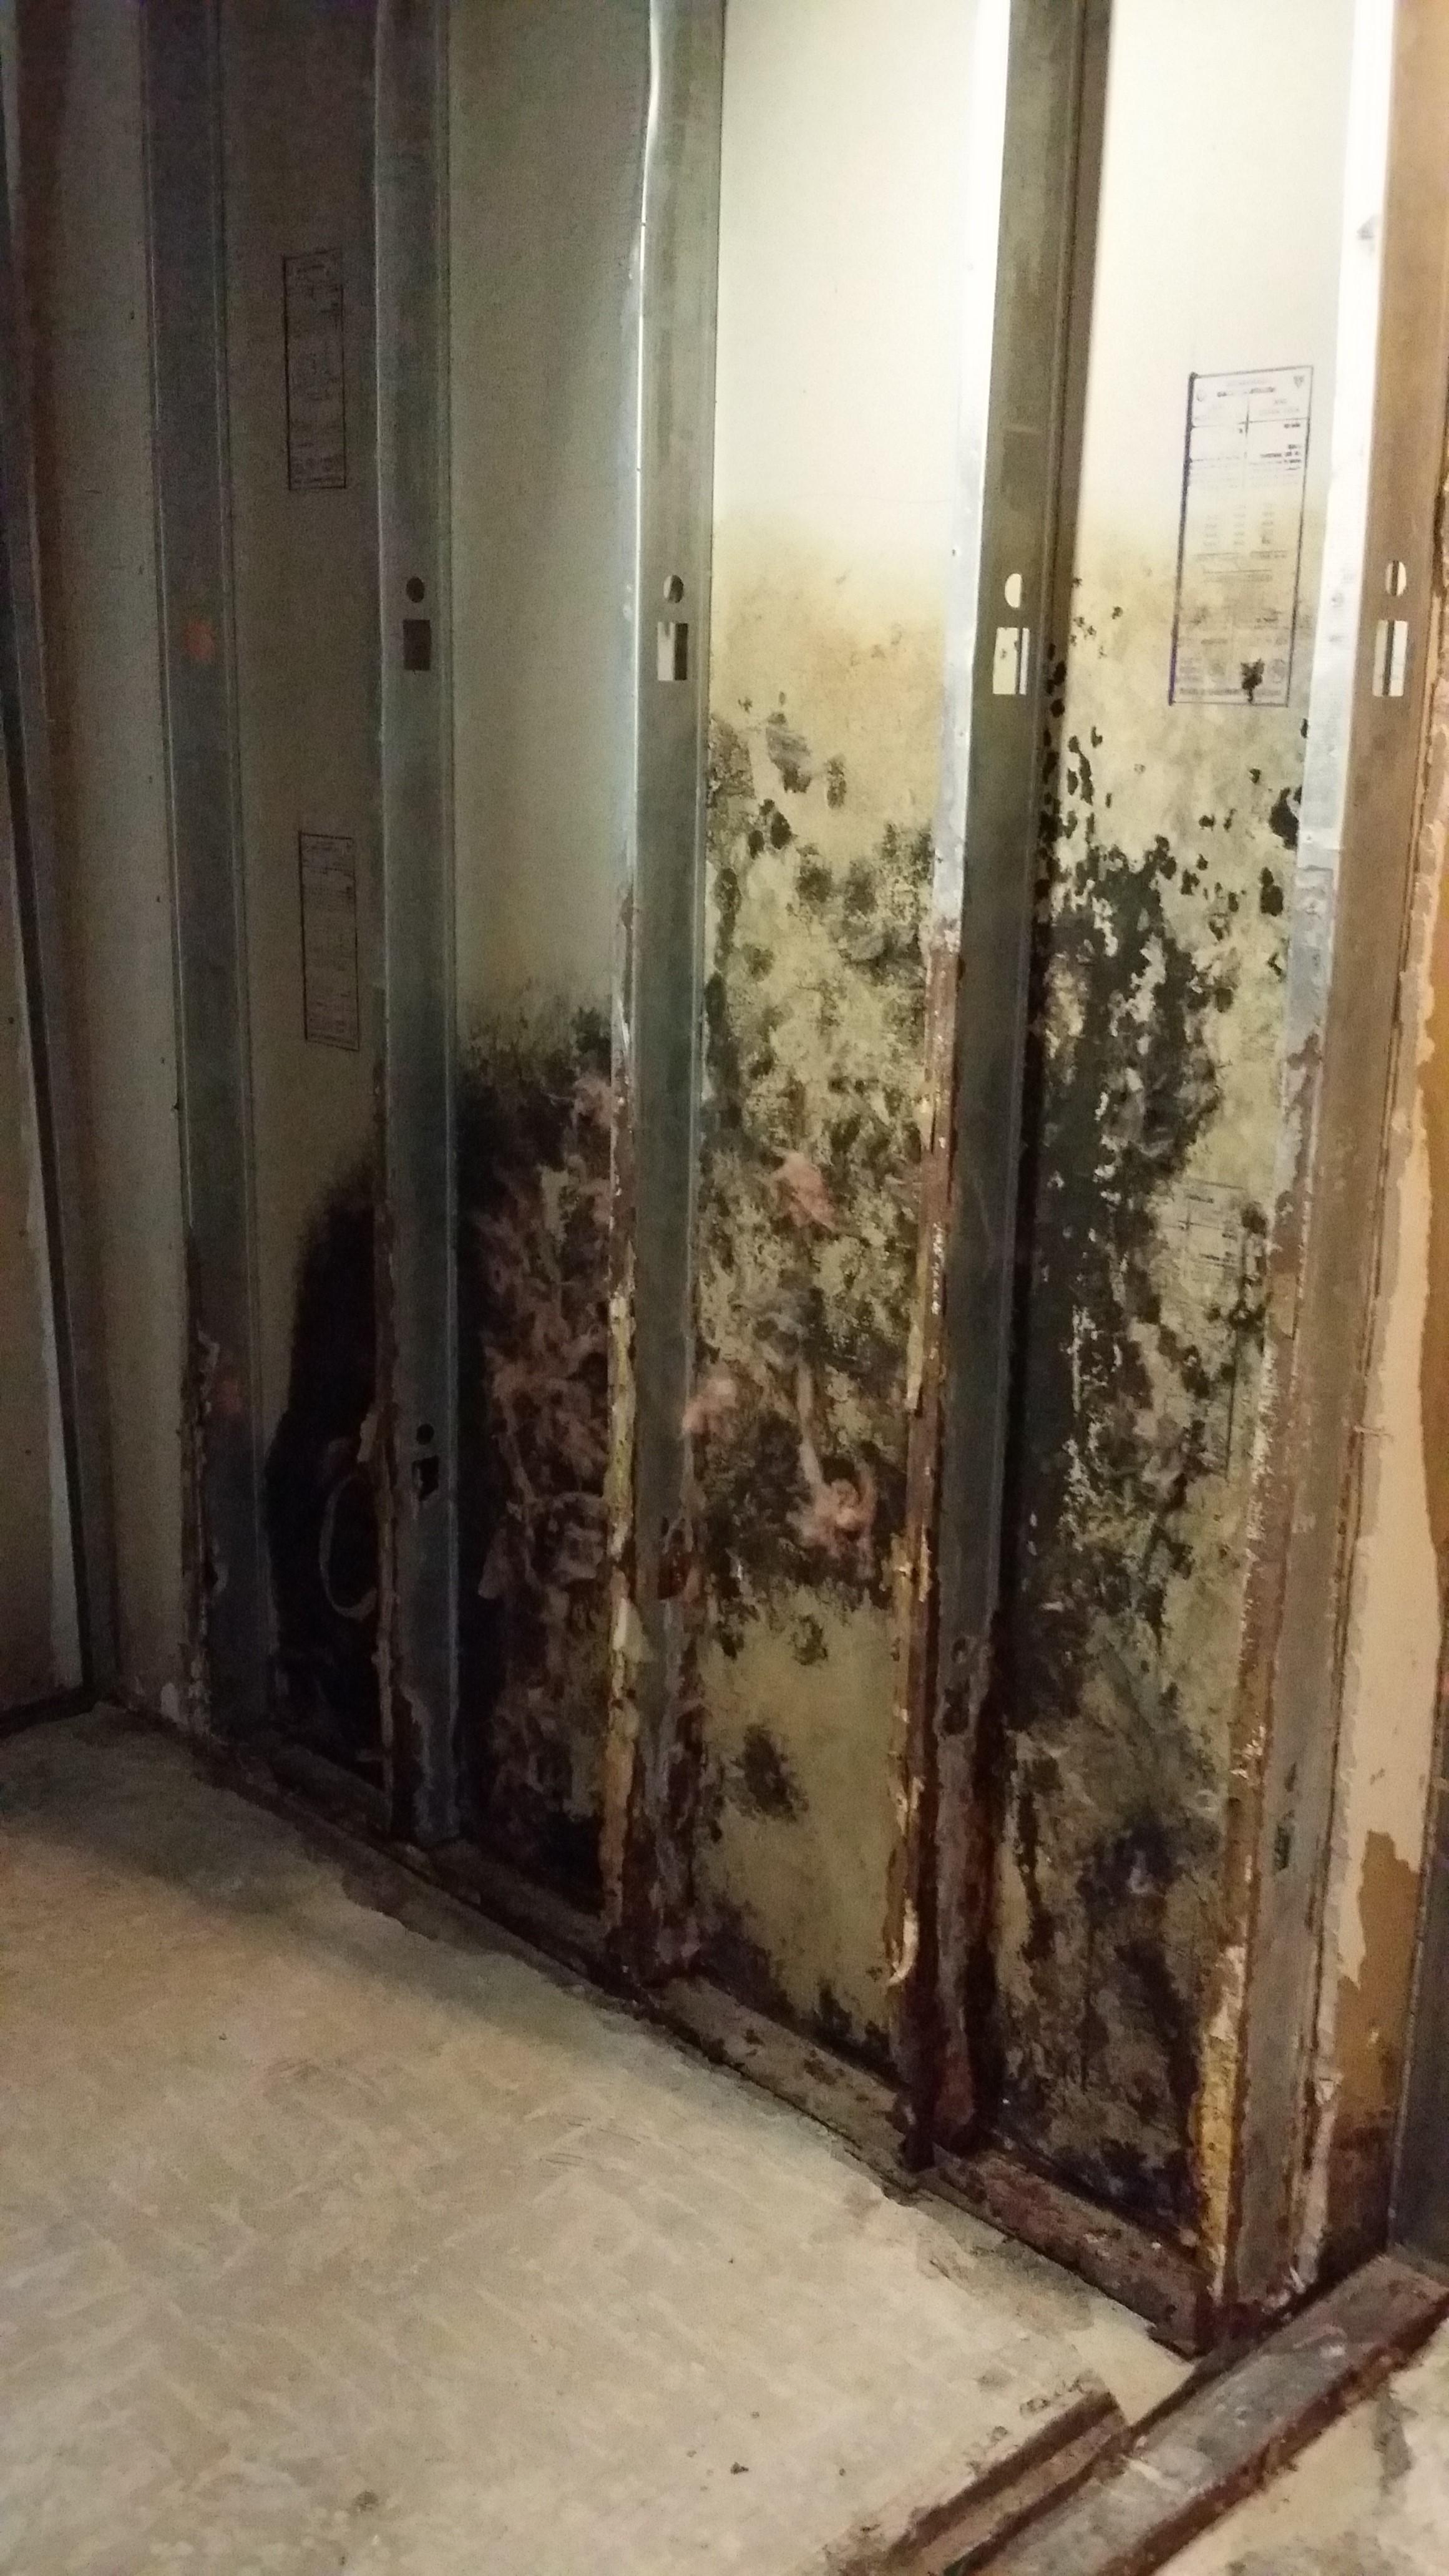 In Progress Demolition. Detail of Rusty Studs.